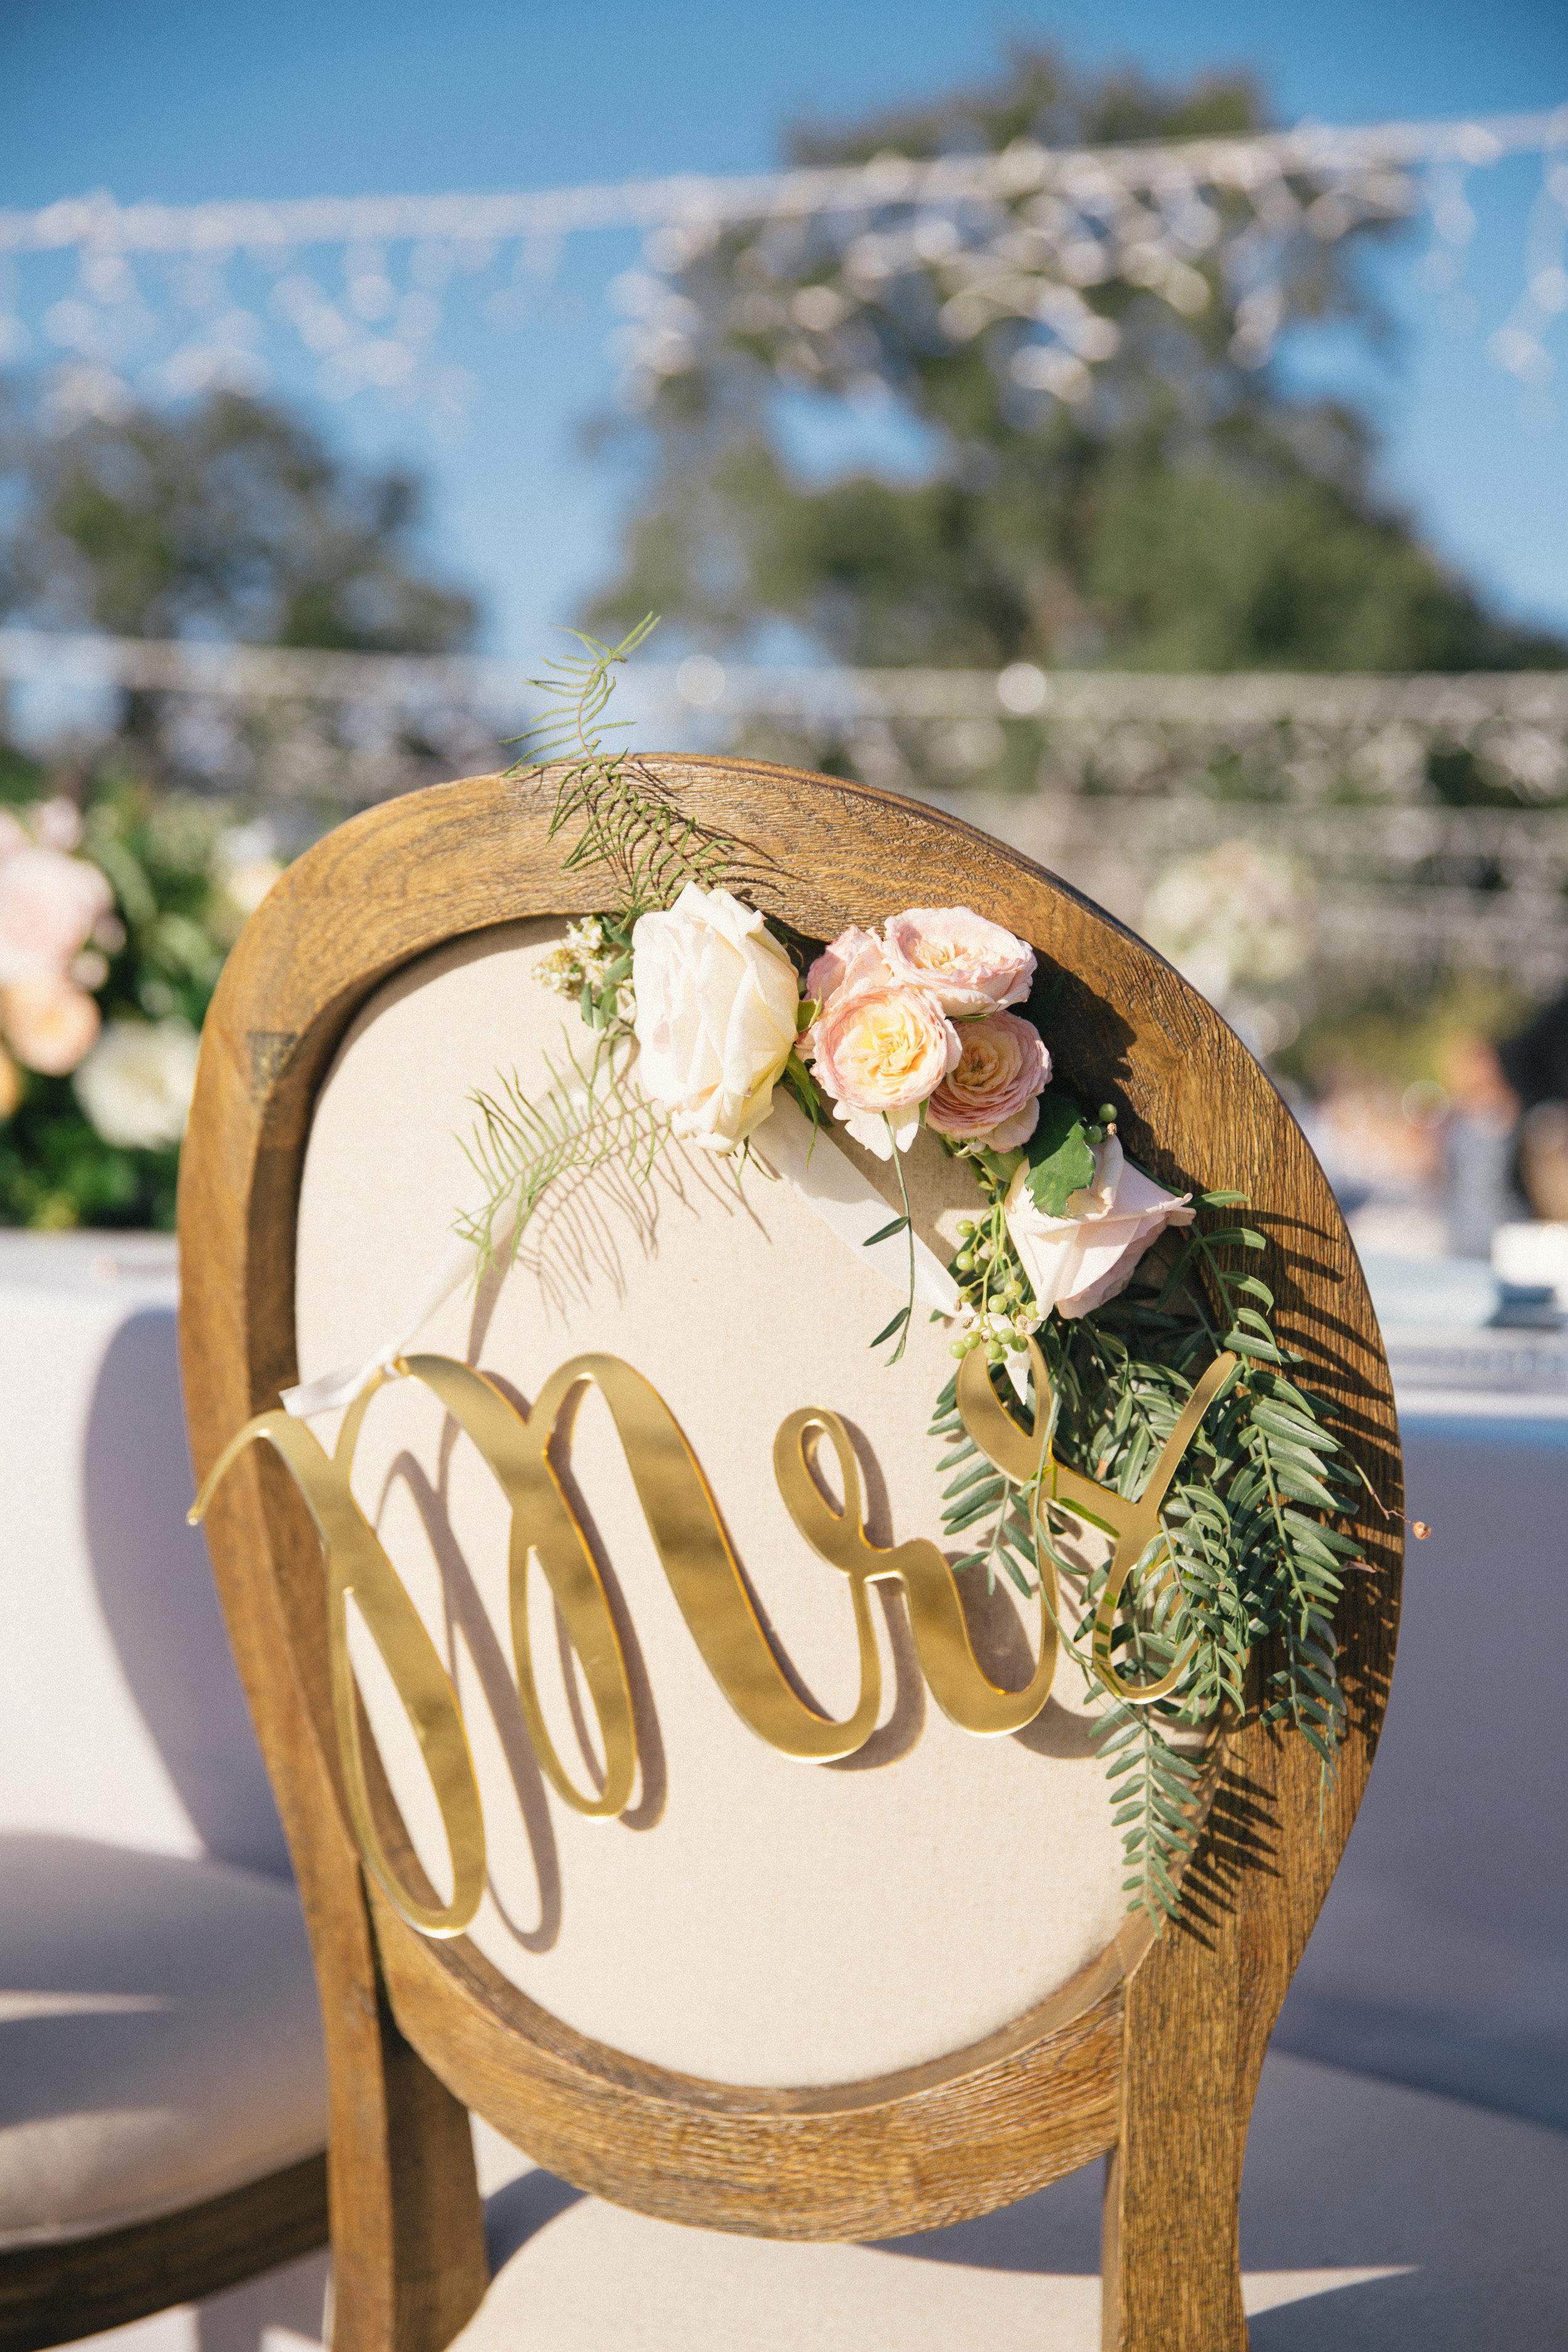 Violette-fleurs-event-design-roseville-anna-perevertaylo-rancho-robles-vinyards-Upscale-Sacramento-Groom-Bride-chair-sign-acrylic.jpg